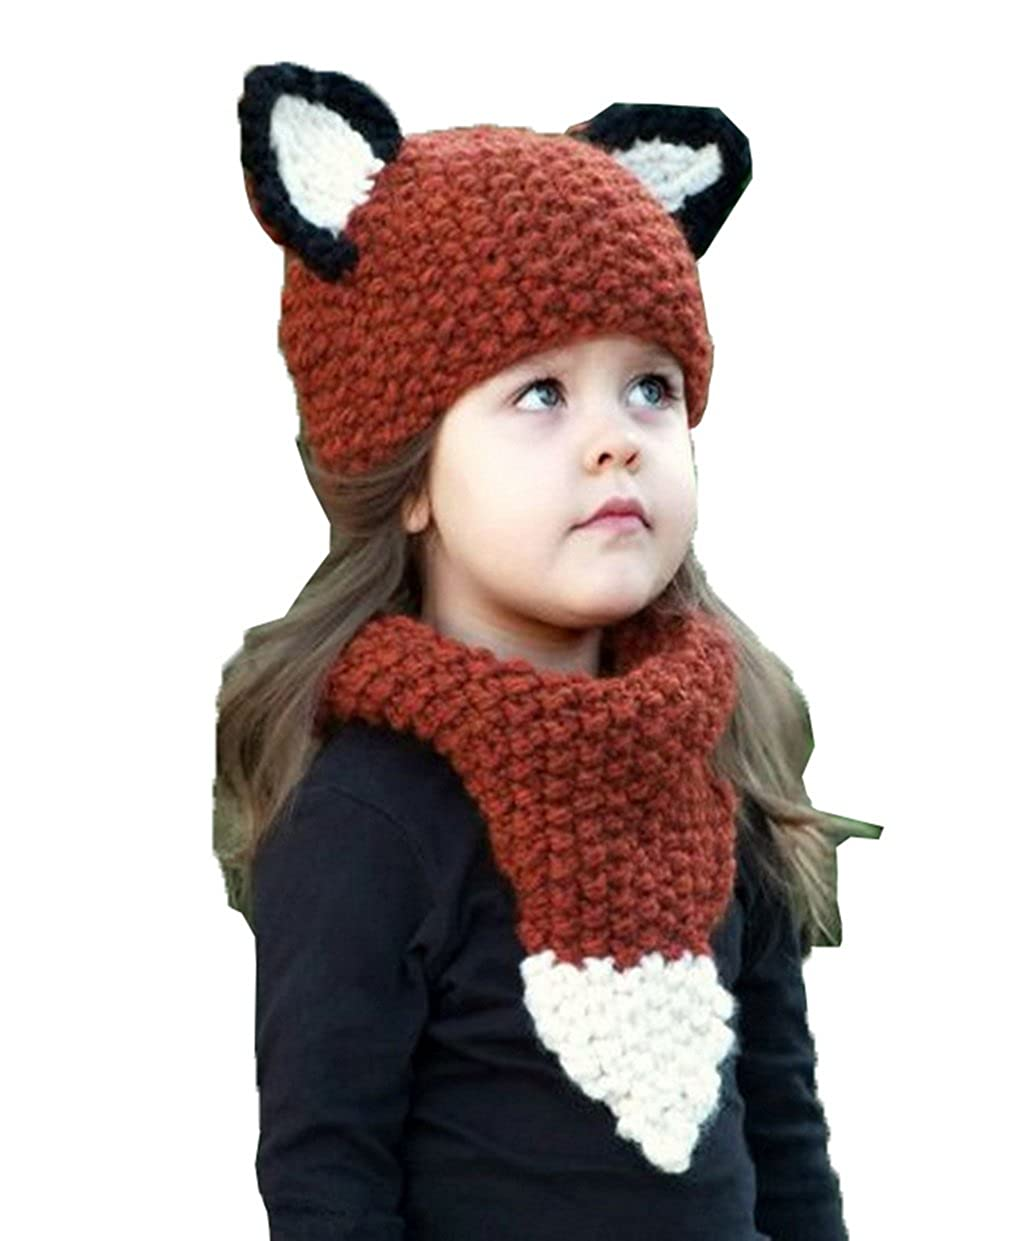 COMVIP Baby Kids Winter Beanies Knit Caps Hooded Fox Ear Hat Scarves Wine 7HAT049*1$EE